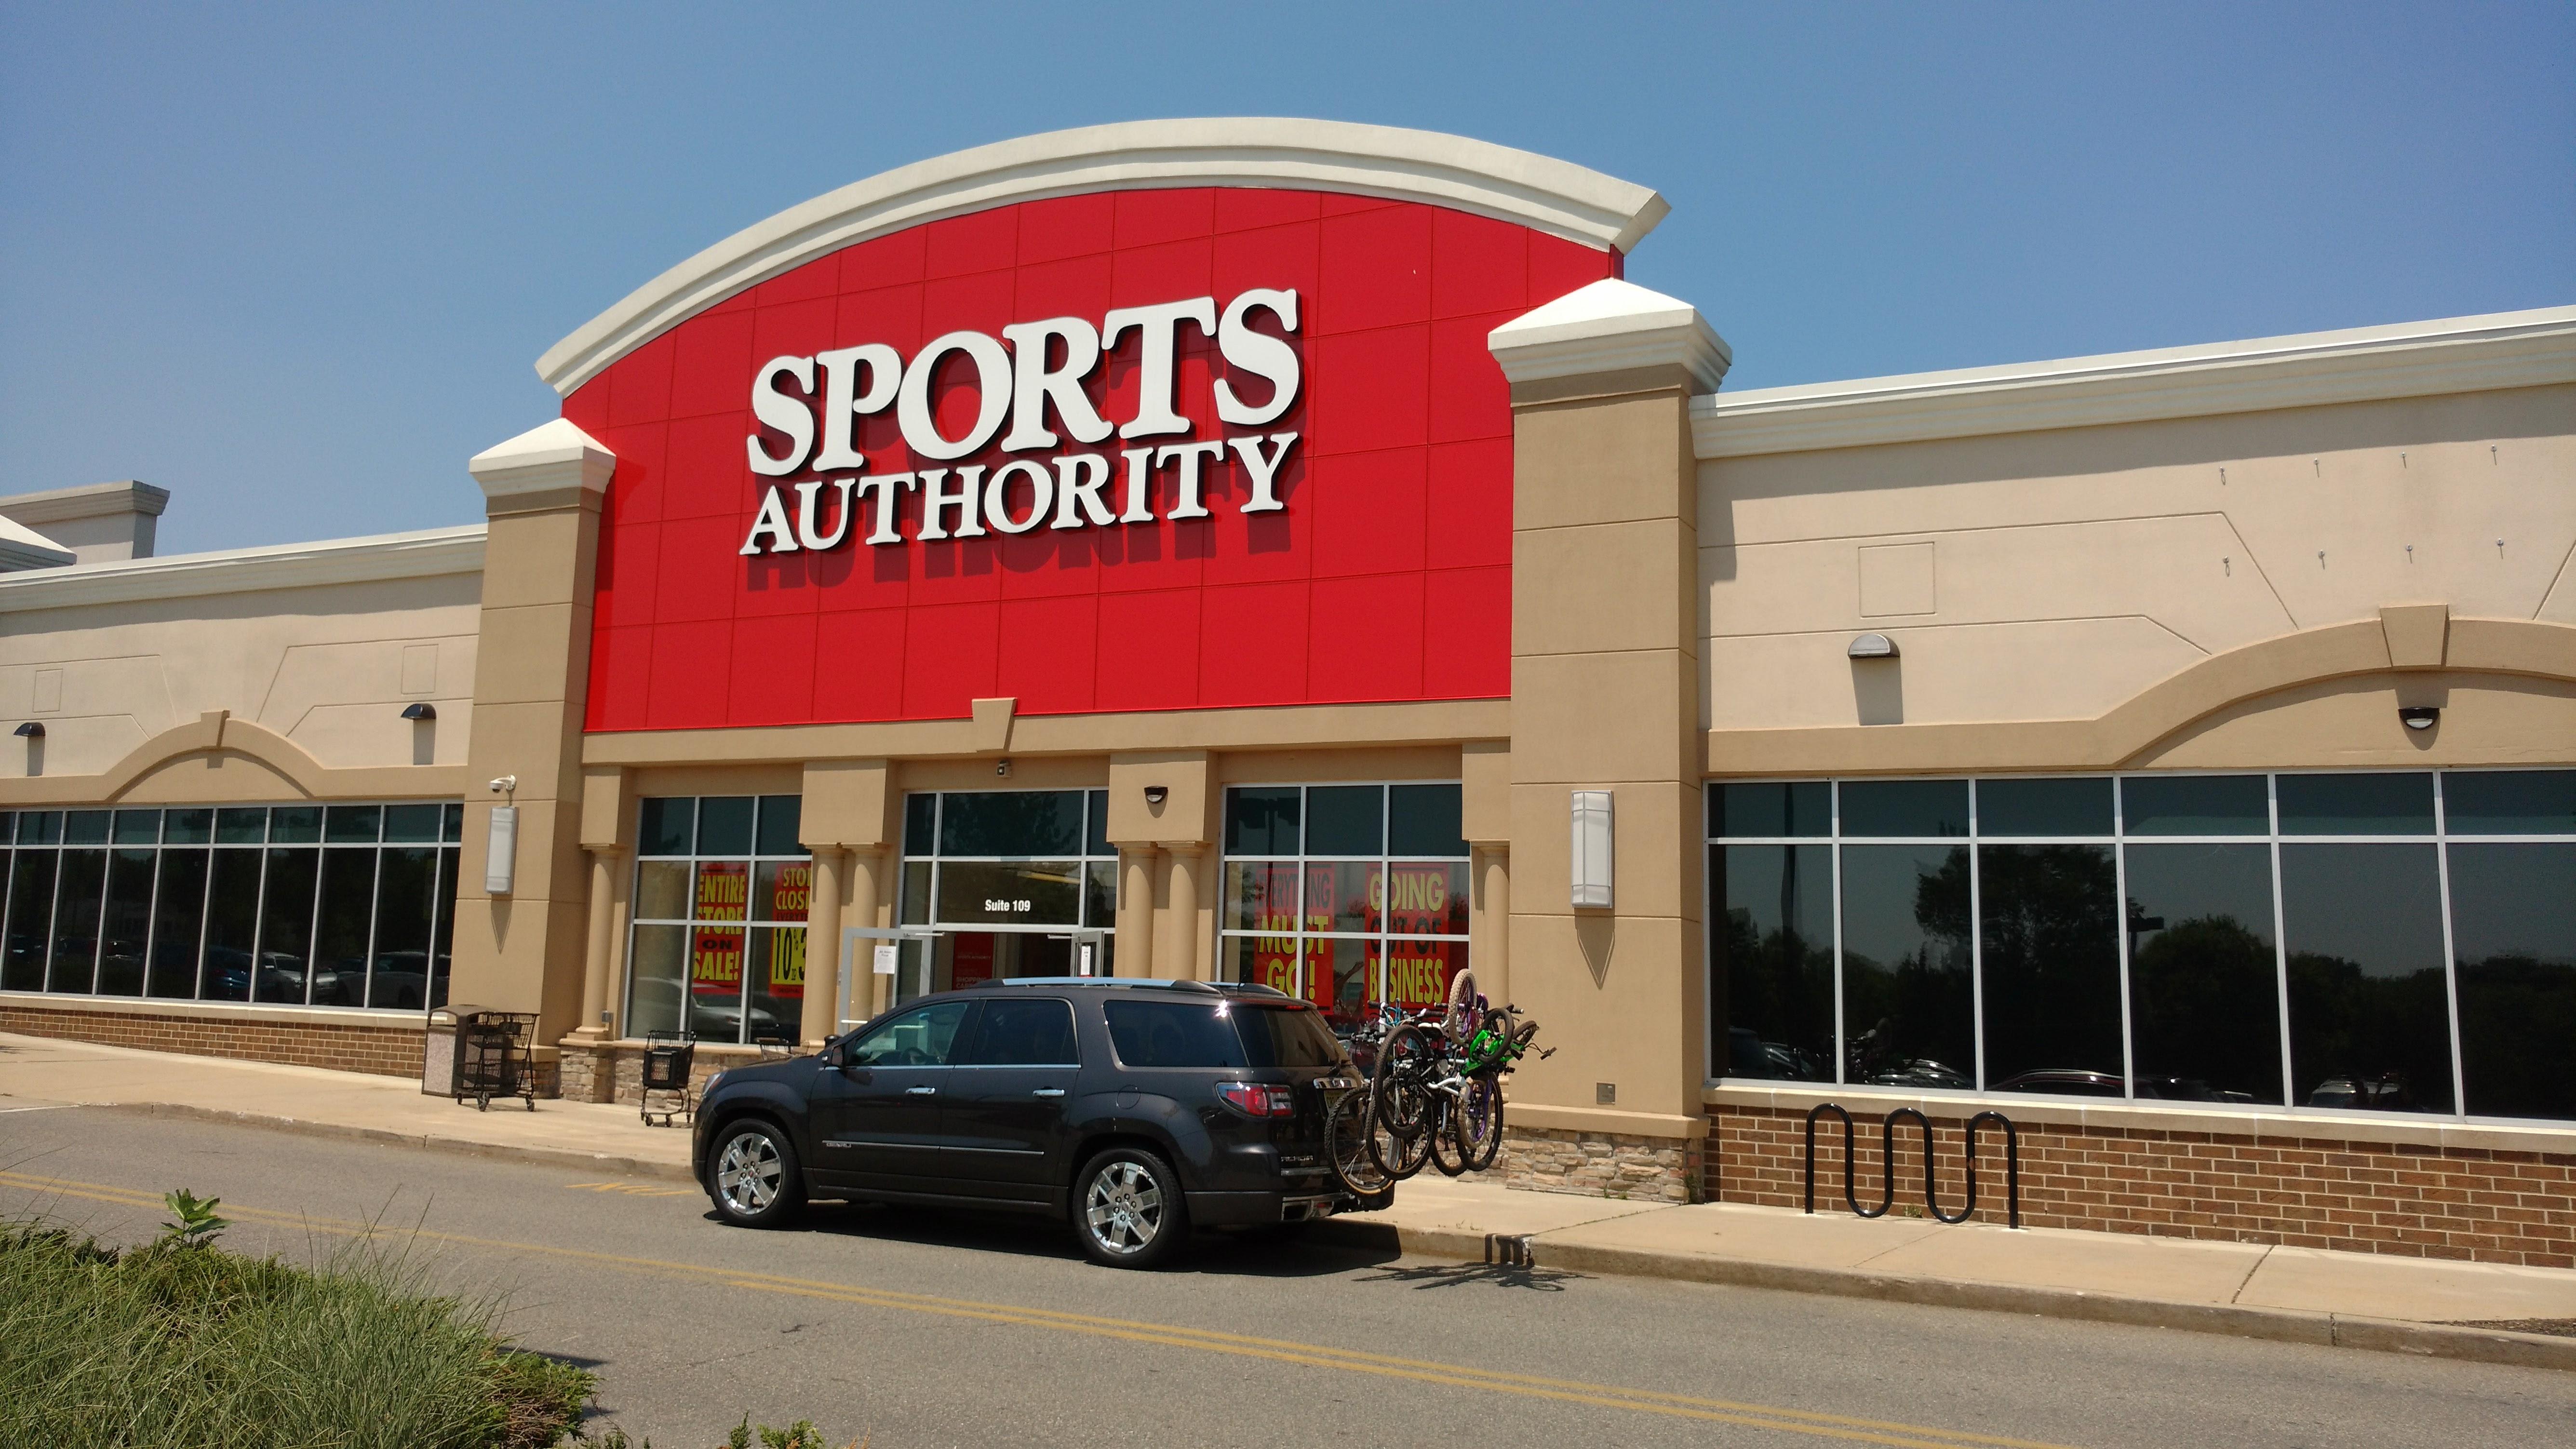 sports authority flemington jersey file retail apocalypse wikipedia commons wikimedia location bankrupt closure